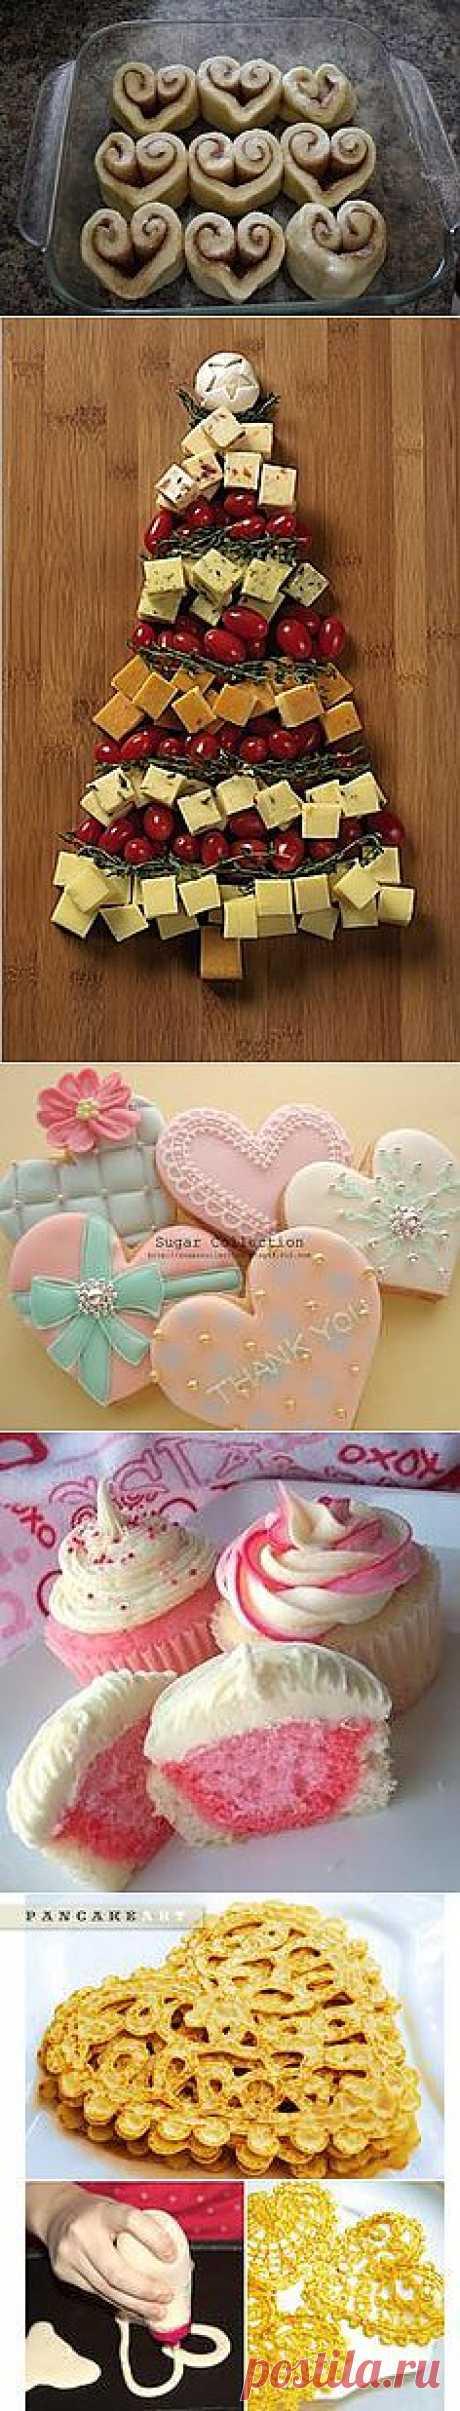 Heart Cinnamon Rolls = LOVE | Food - Breakfast